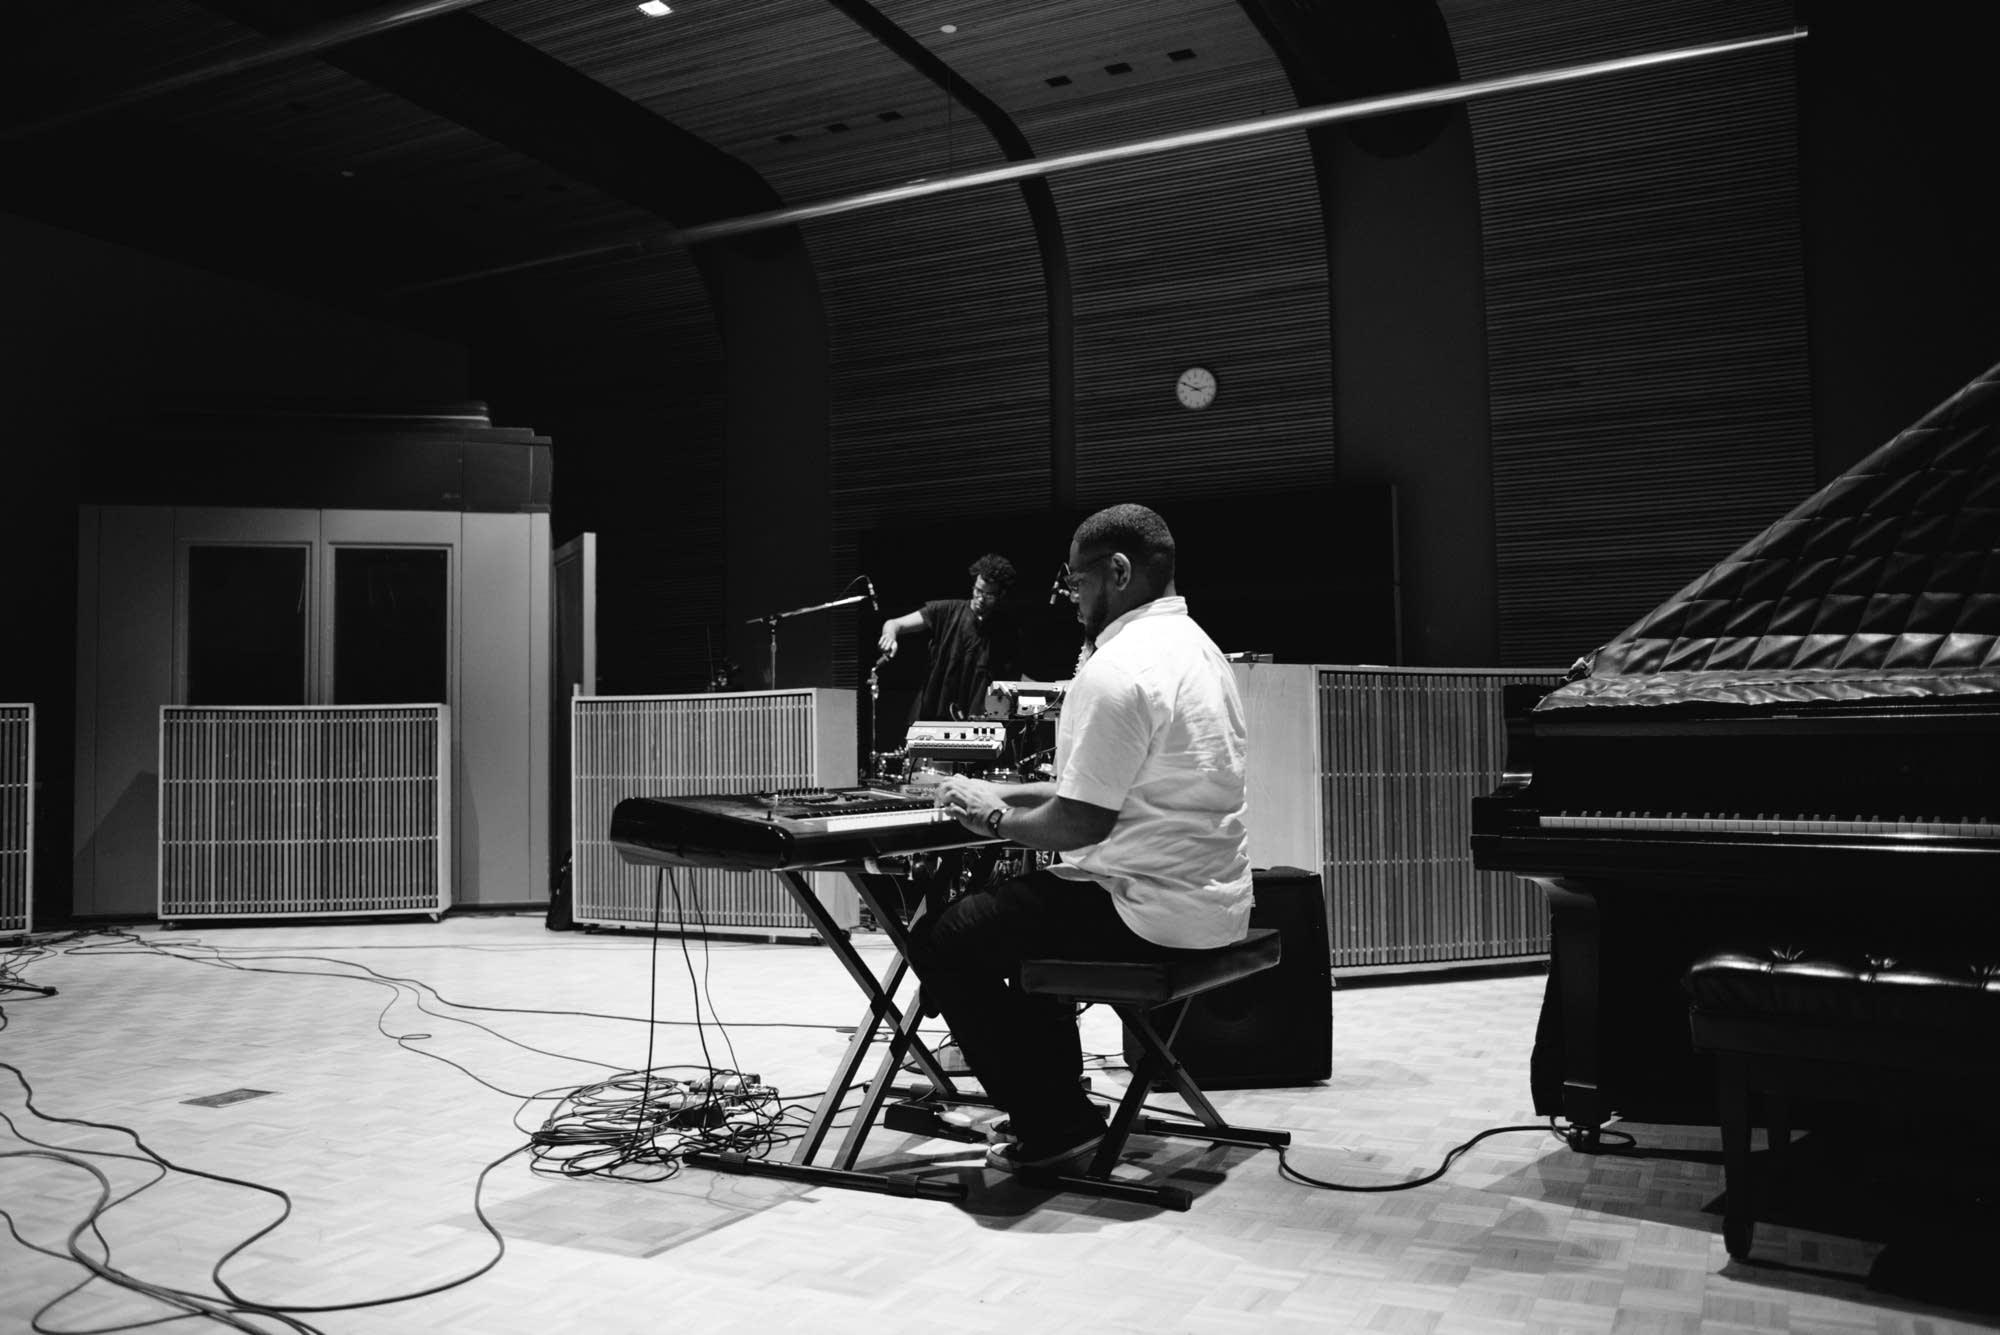 Jacob Dodd in The Current's studio